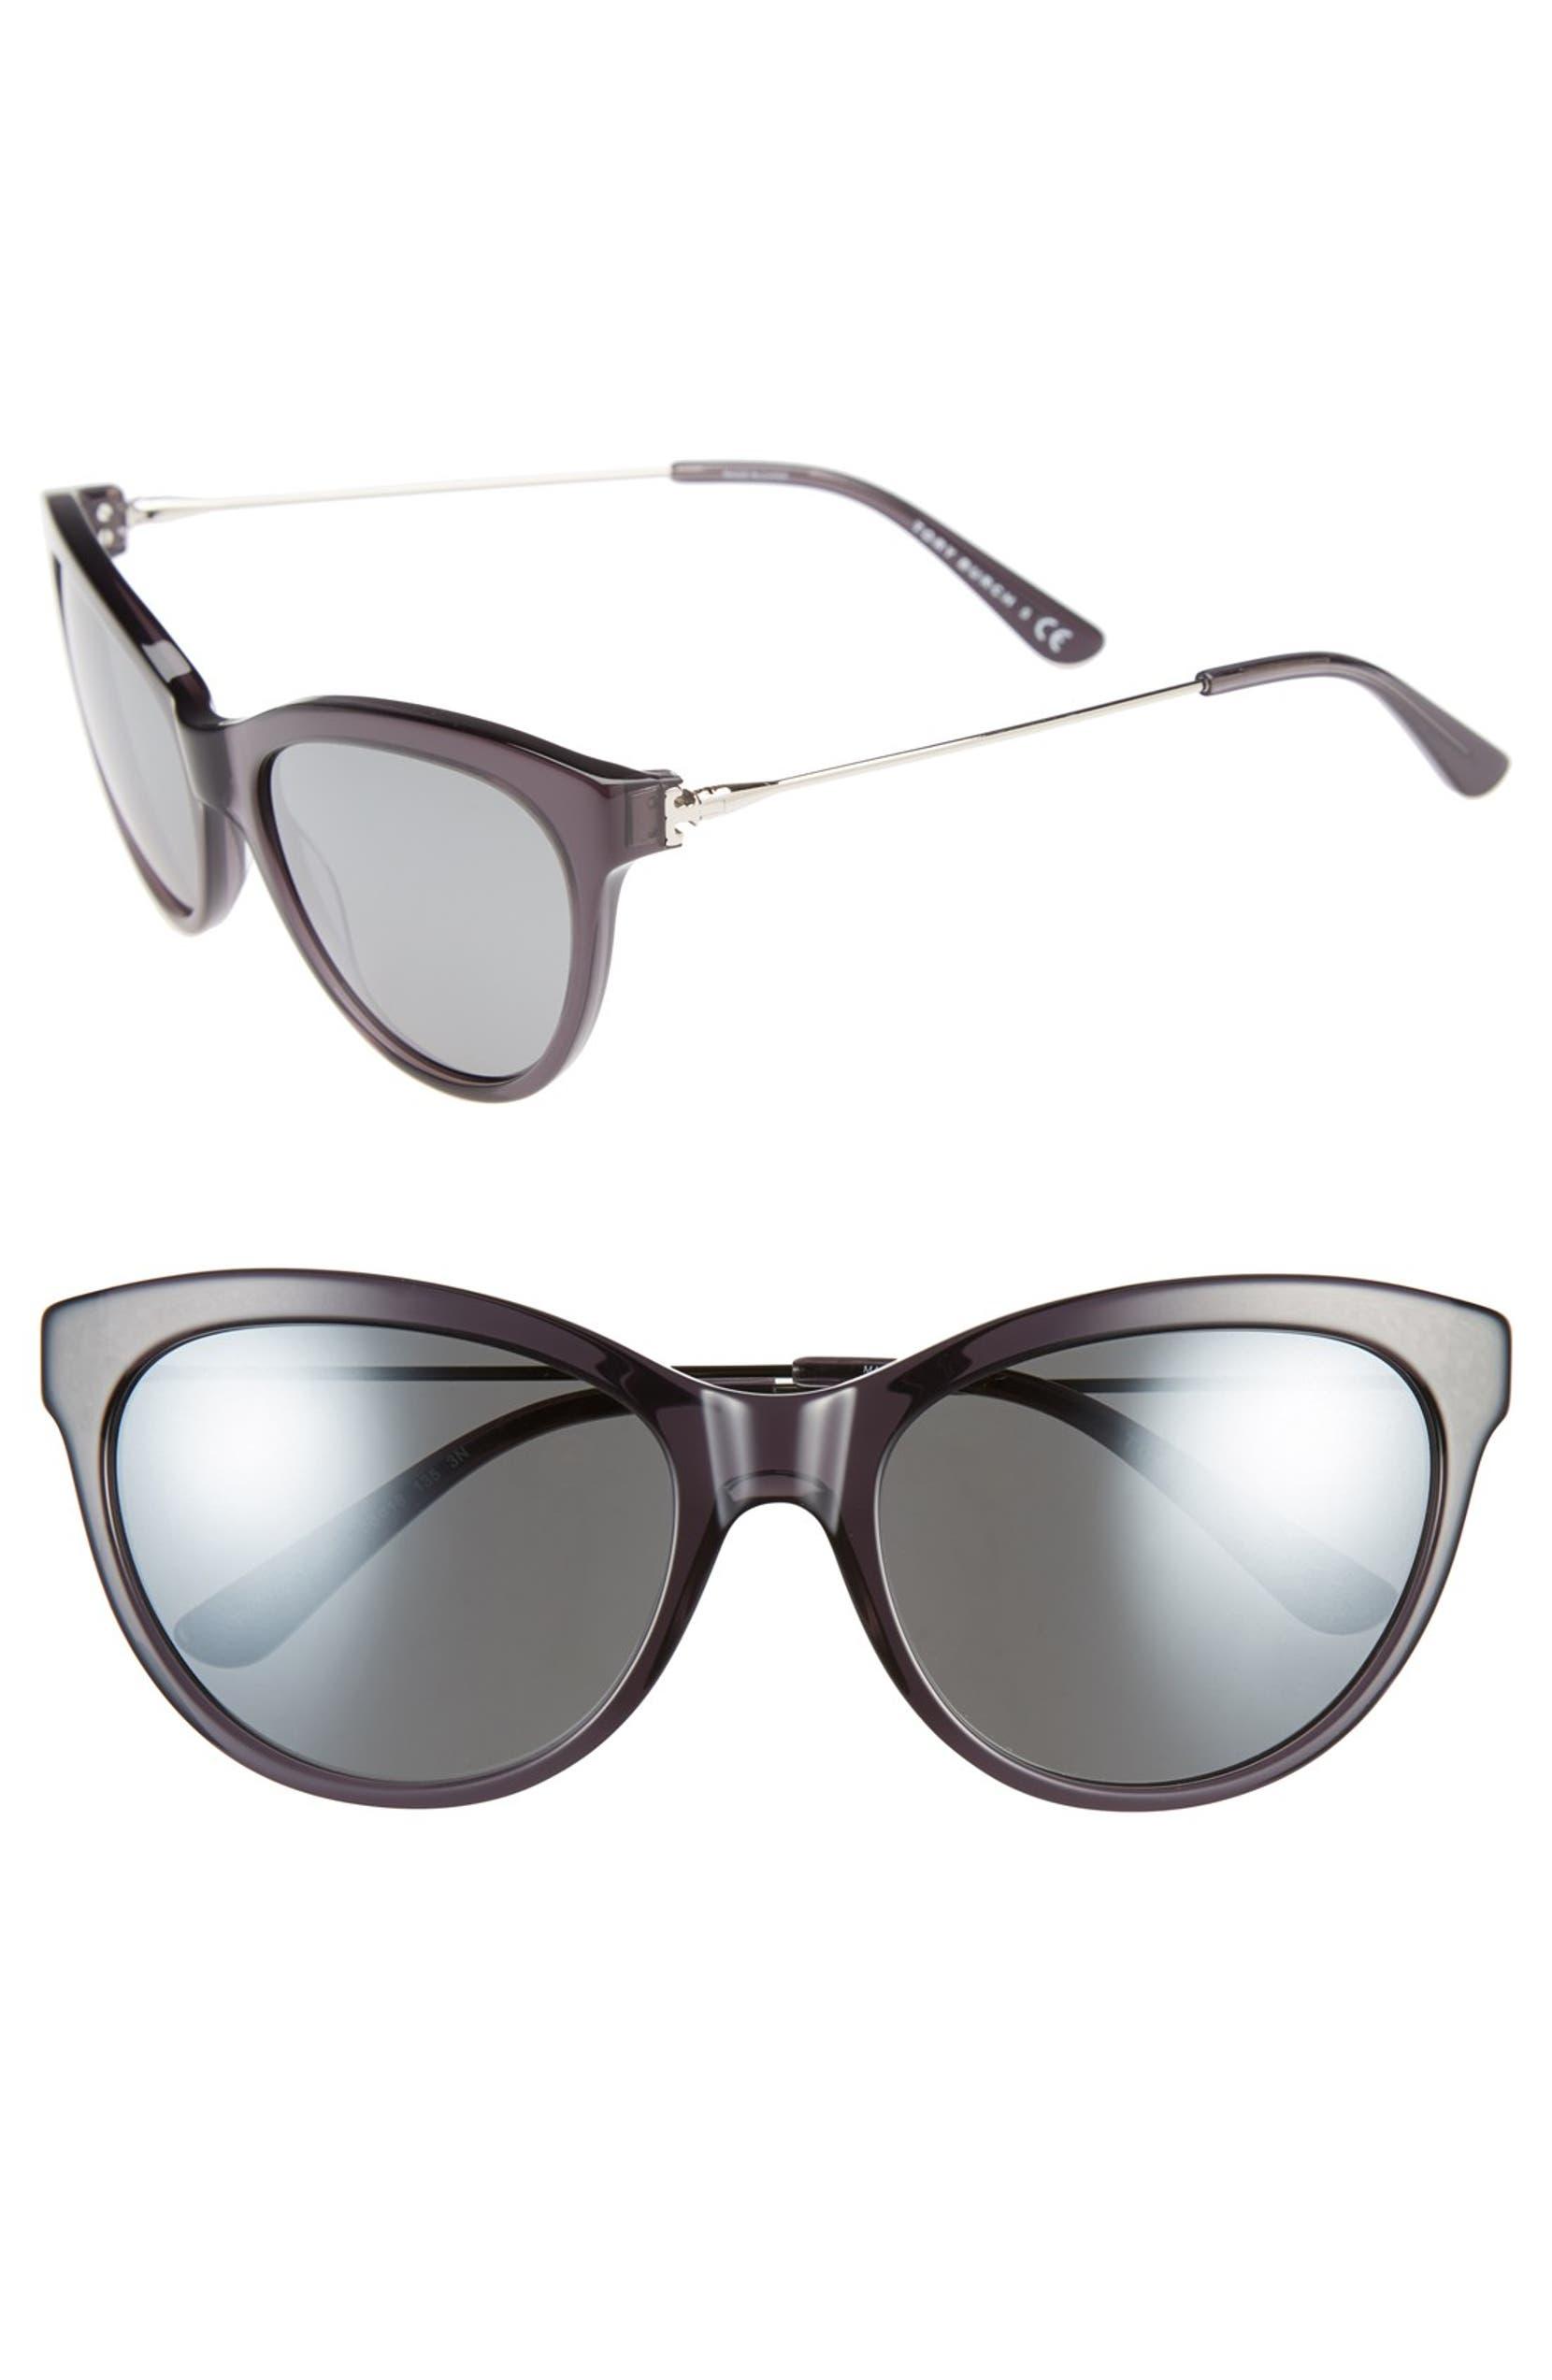 bacbde79c3f8 Tory Burch 'Serif' 56mm Cat Eye Sunglasses | Nordstrom